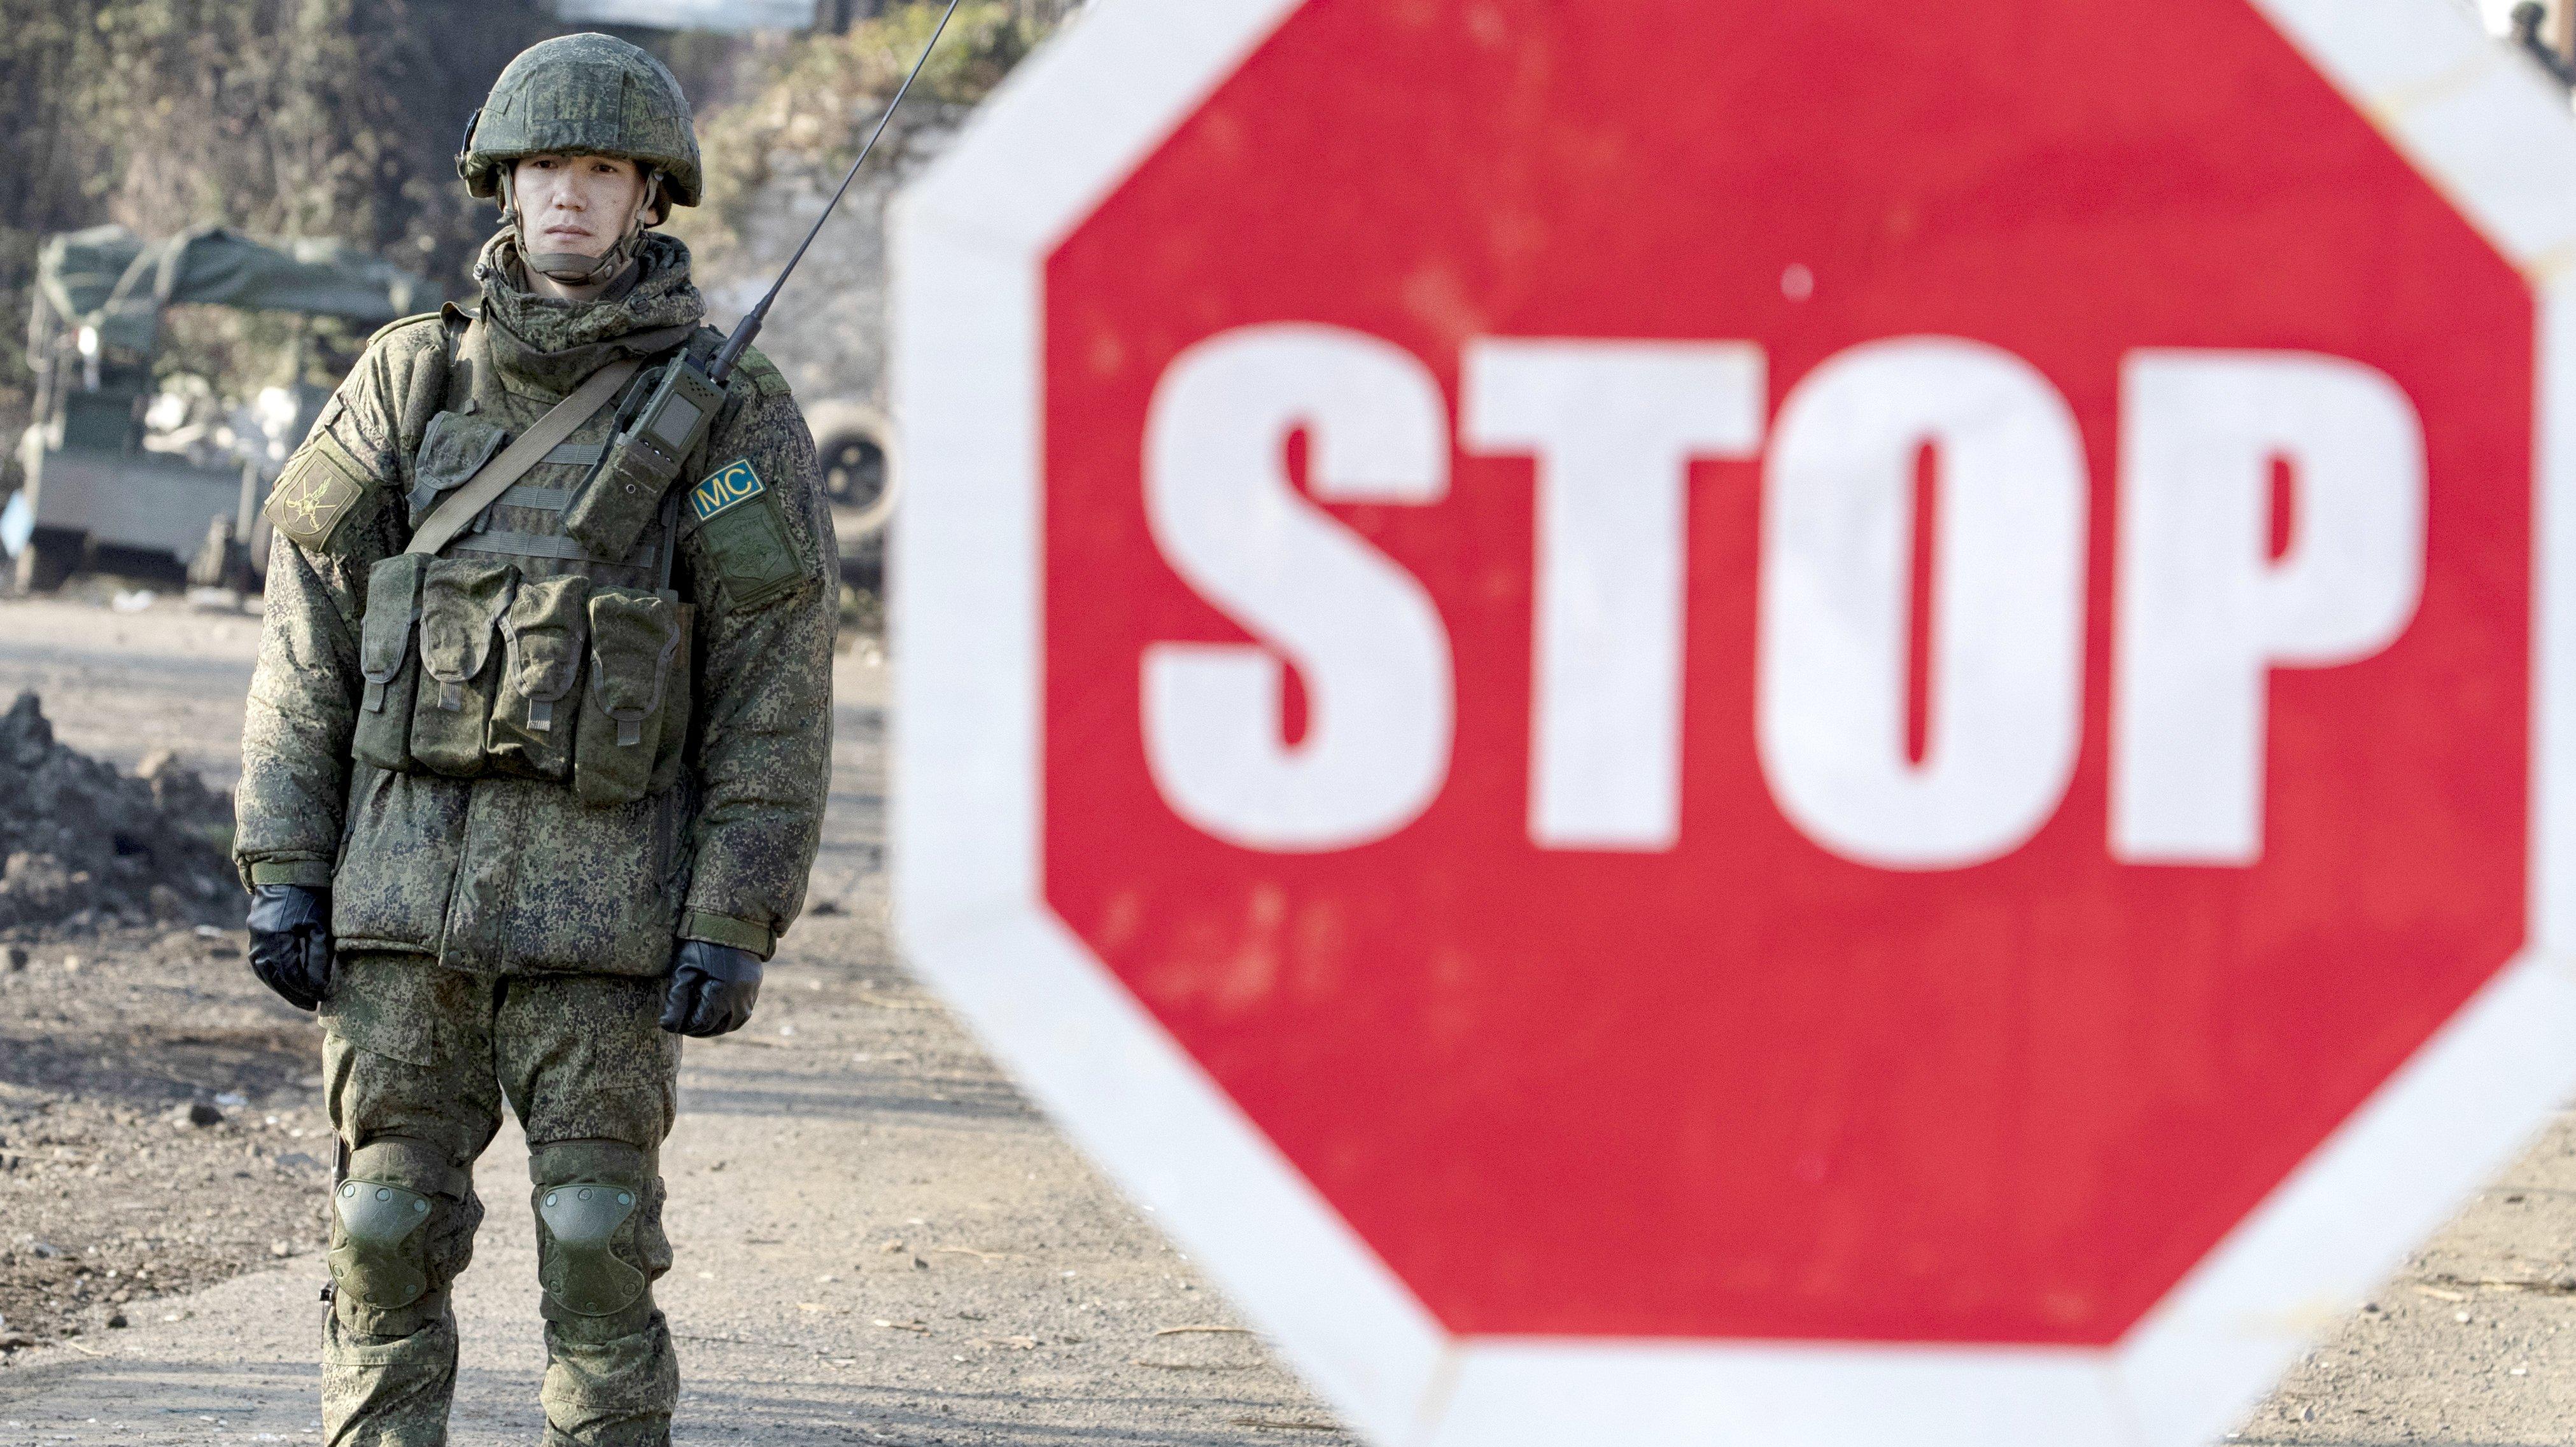 Azerbaijan in aftermath of Nagorno Karabakh military conflict